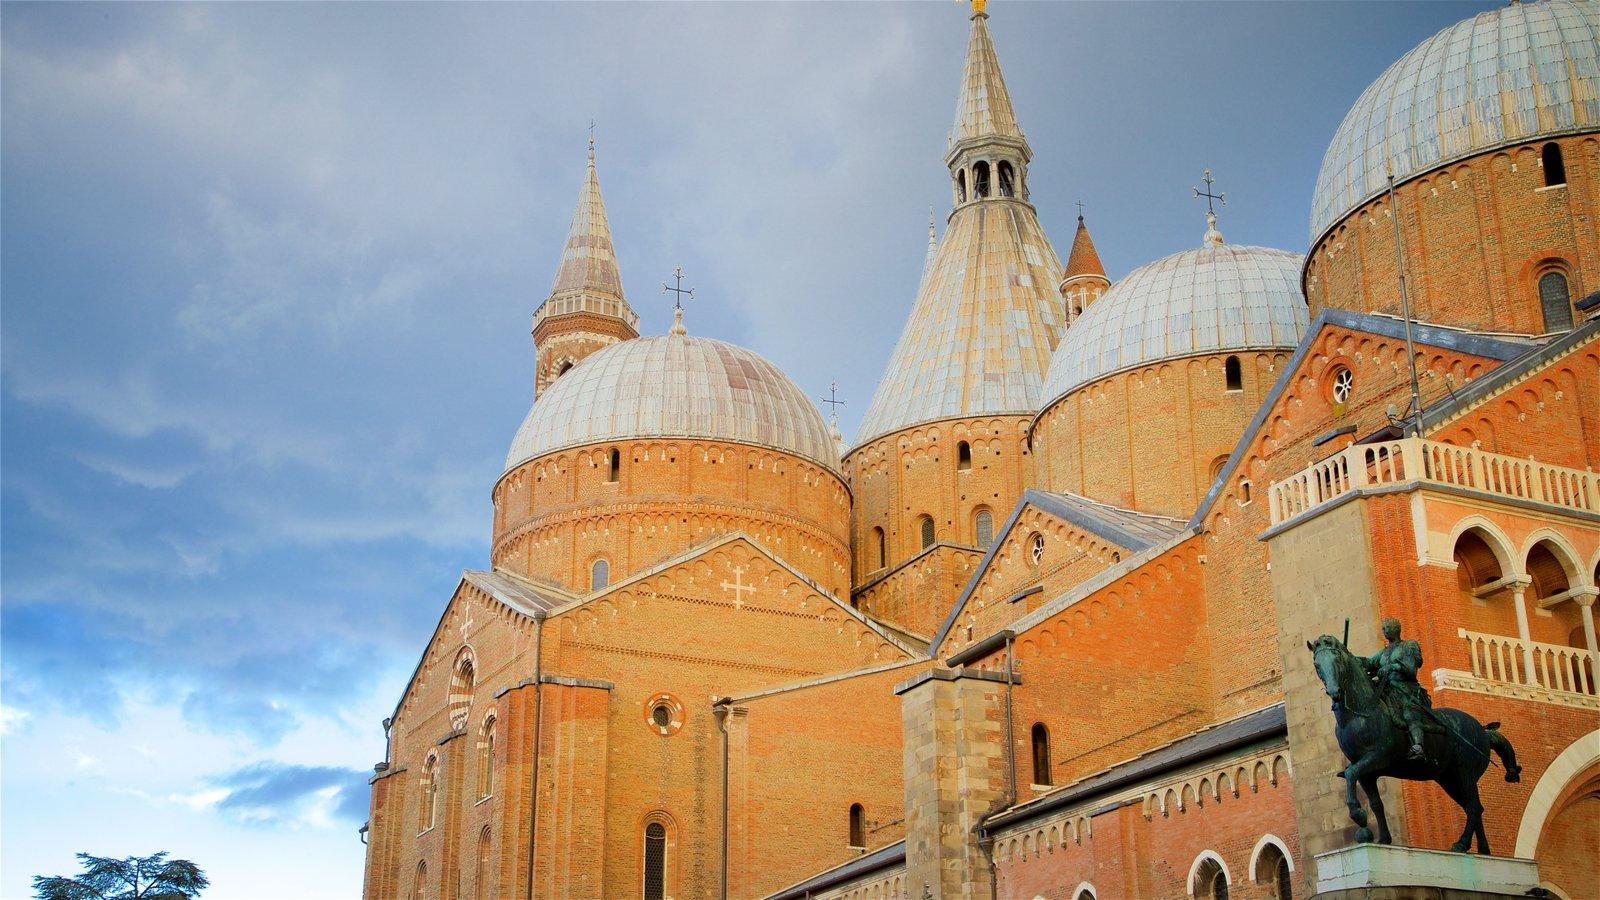 Basilica di Sant\'Antonio da Padova featuring a church or cathedral, a statue or sculpture and heritage architecture